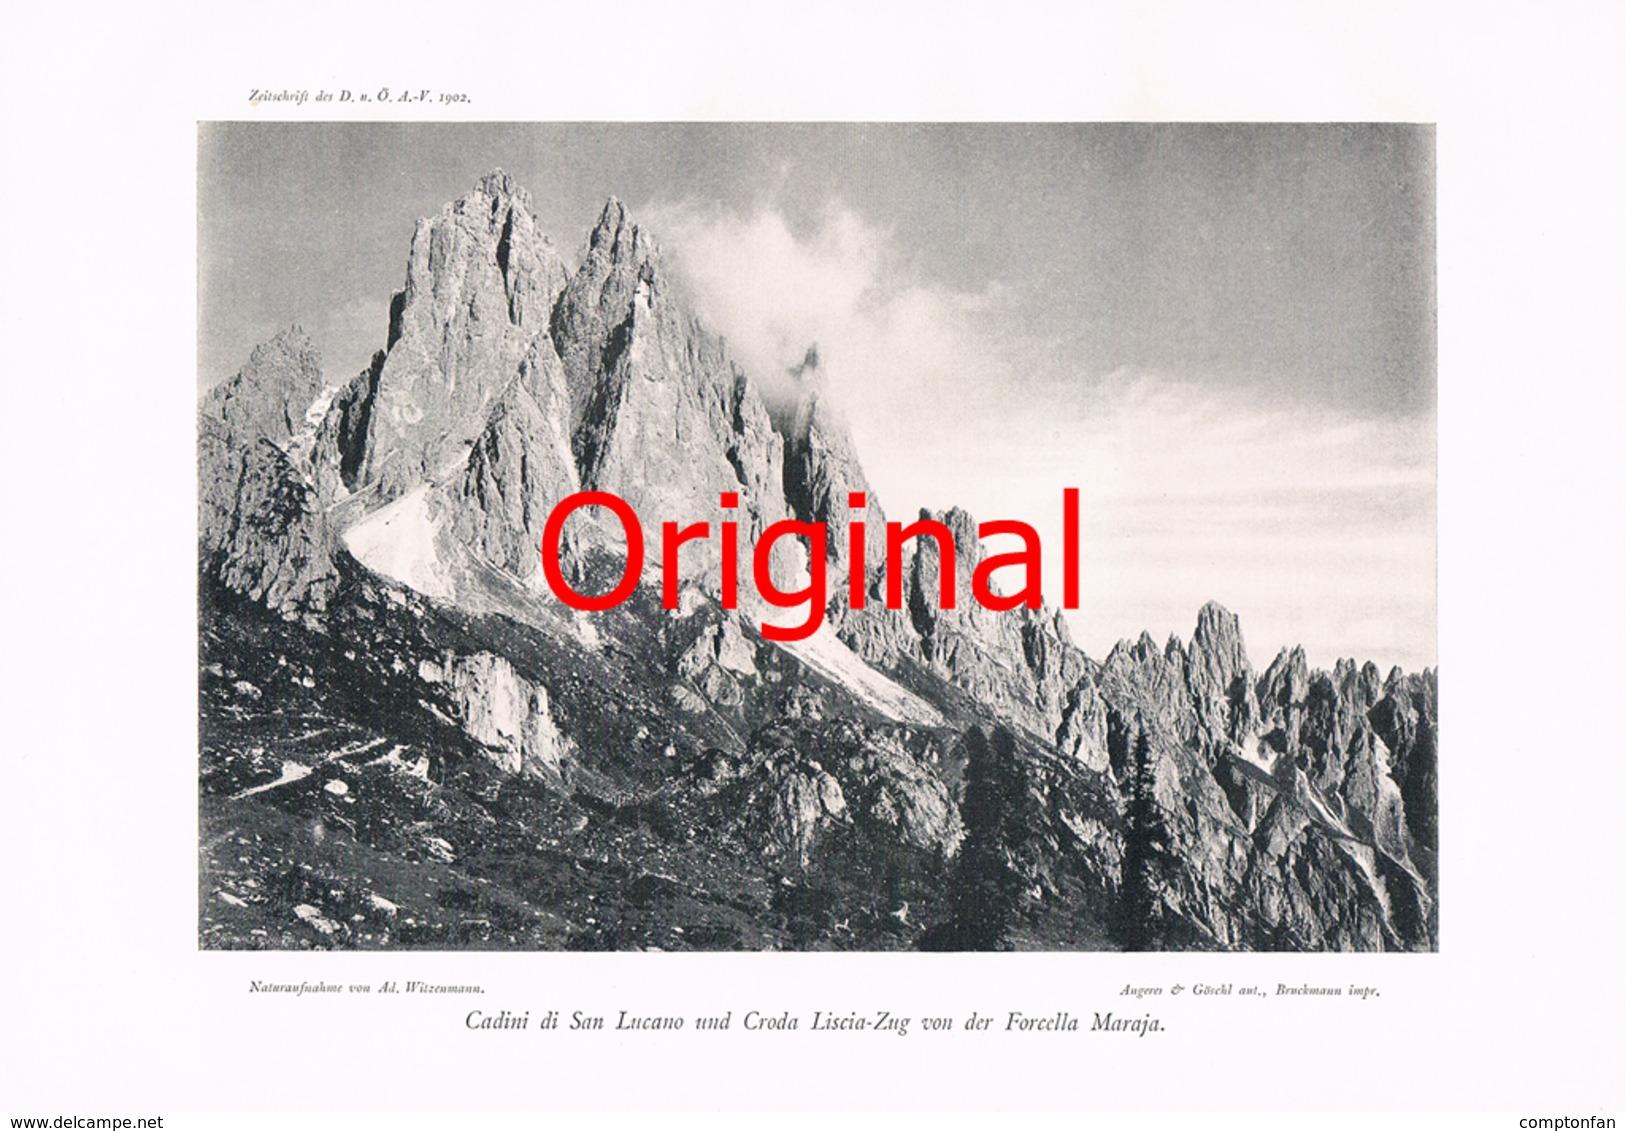 274 Sexten Cadini Di San Lucano Kunstblatt 1902 !! - Historische Dokumente